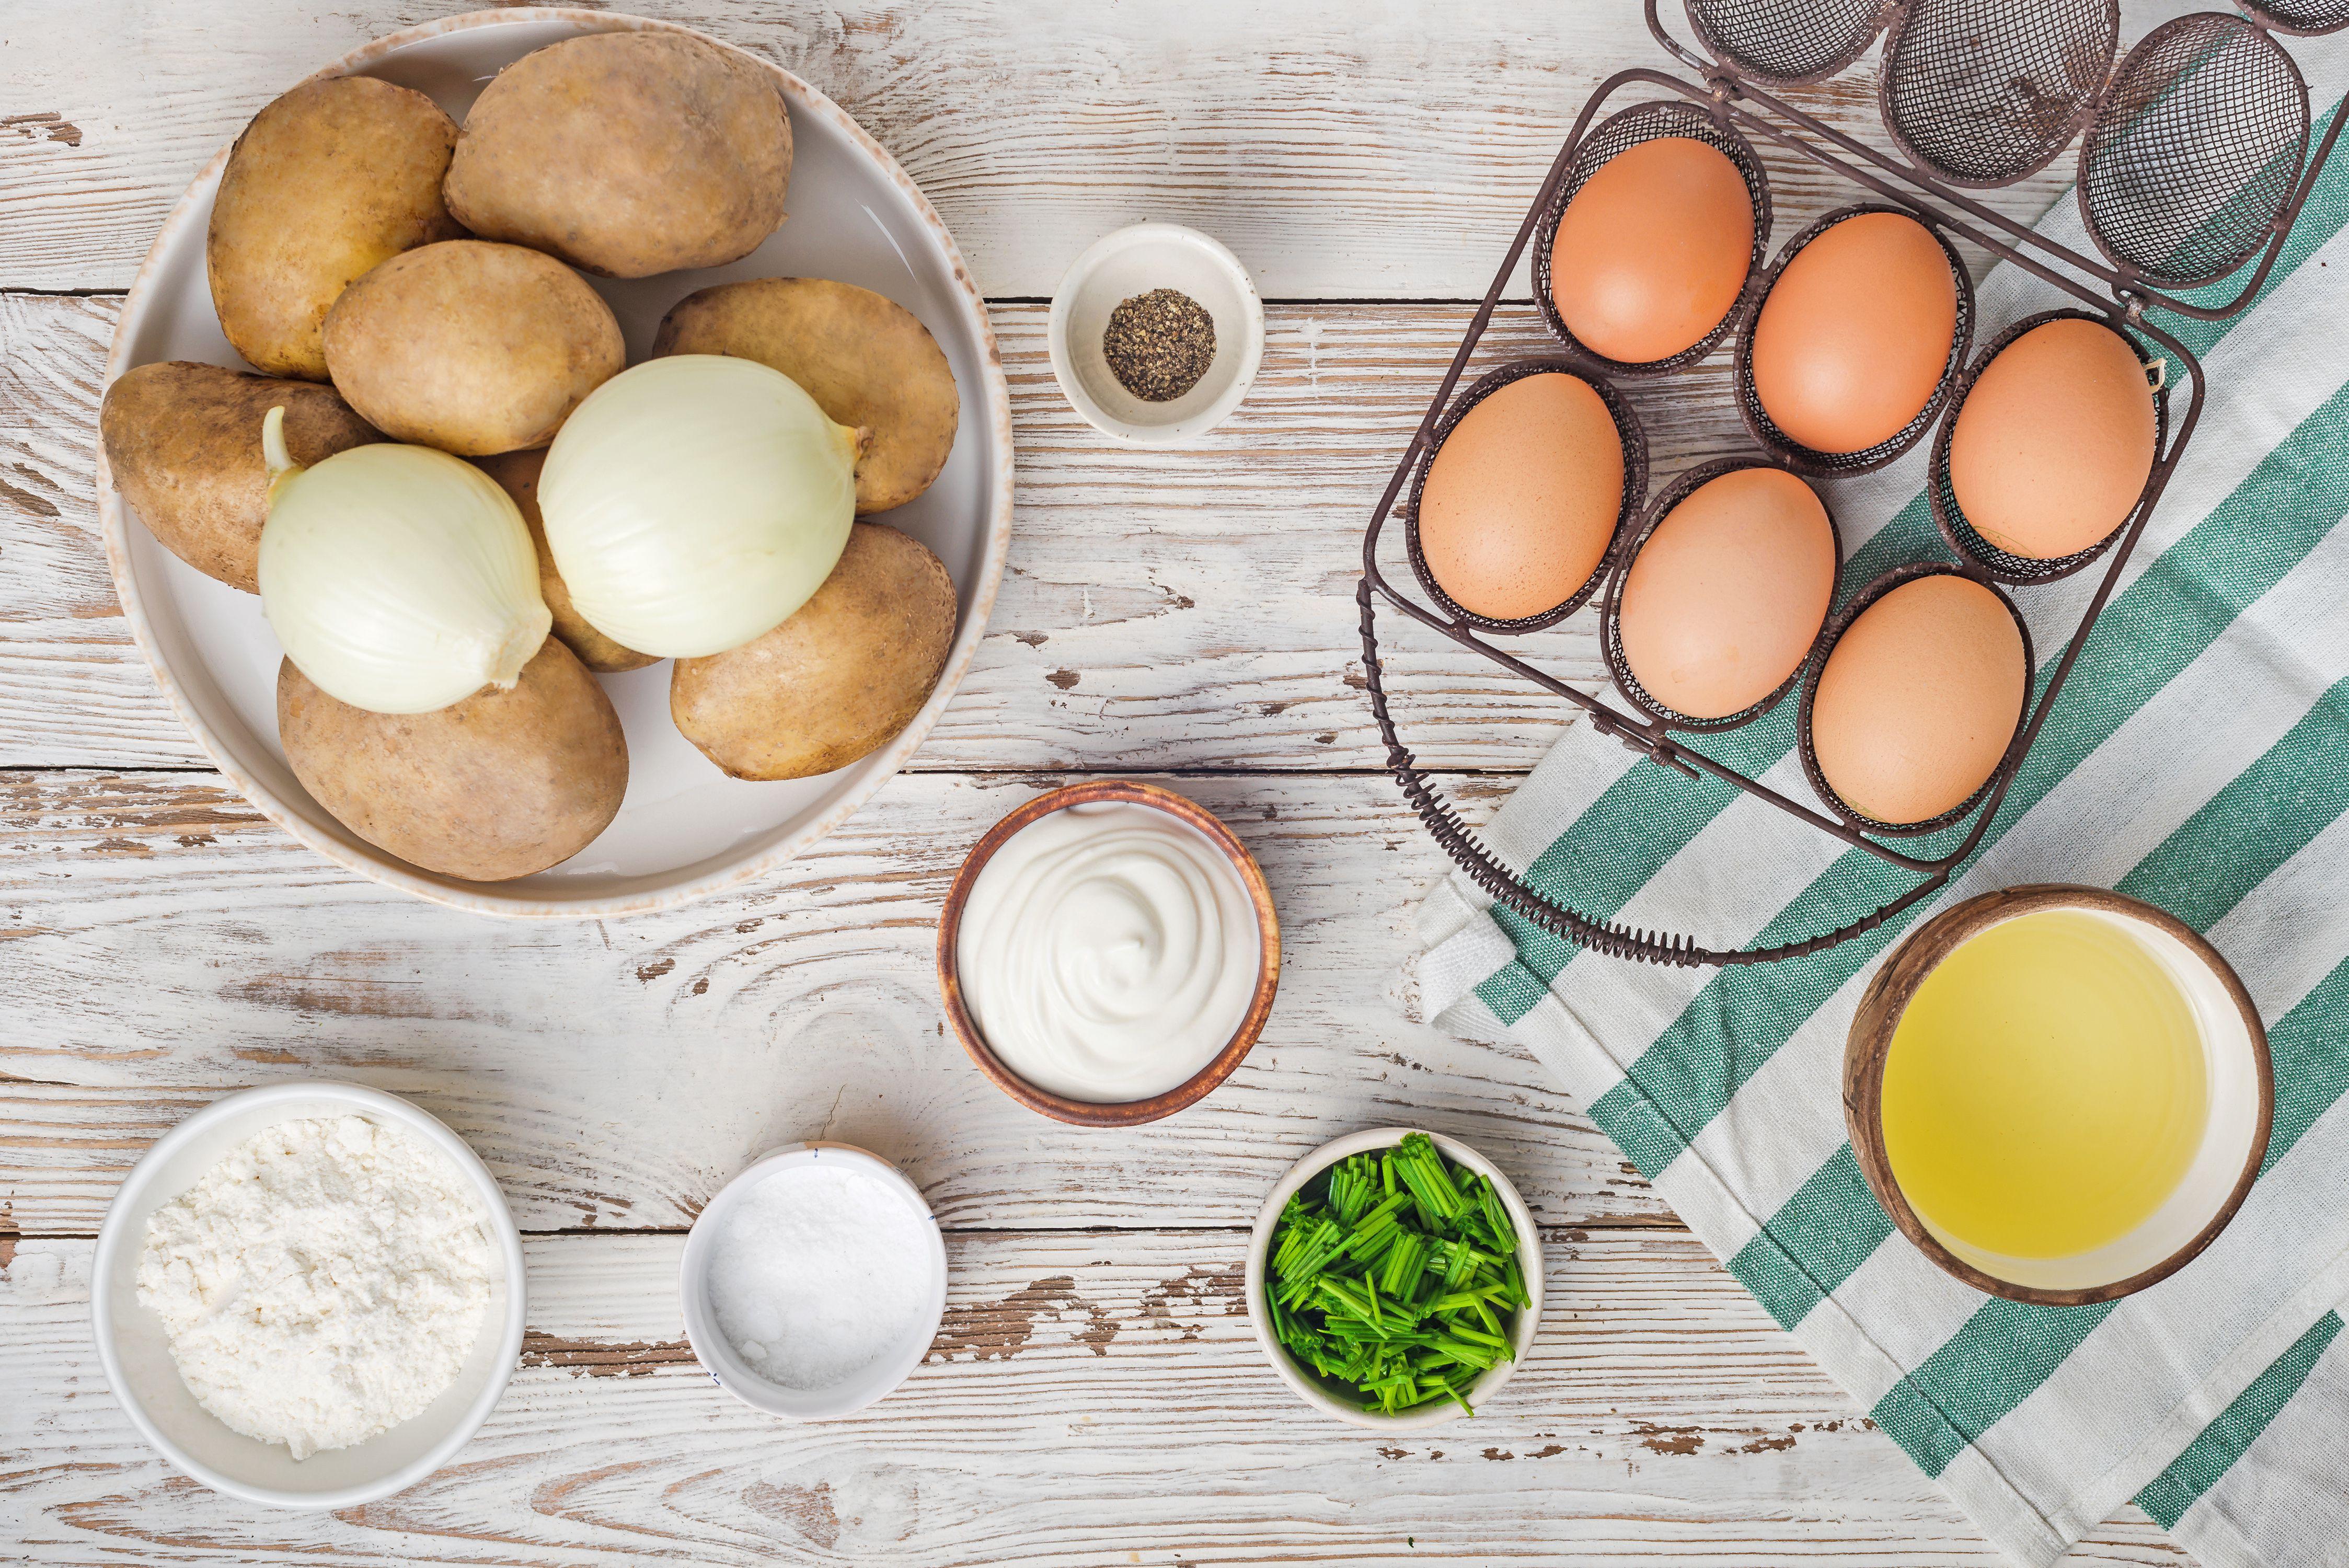 Ingredients for potato kugel